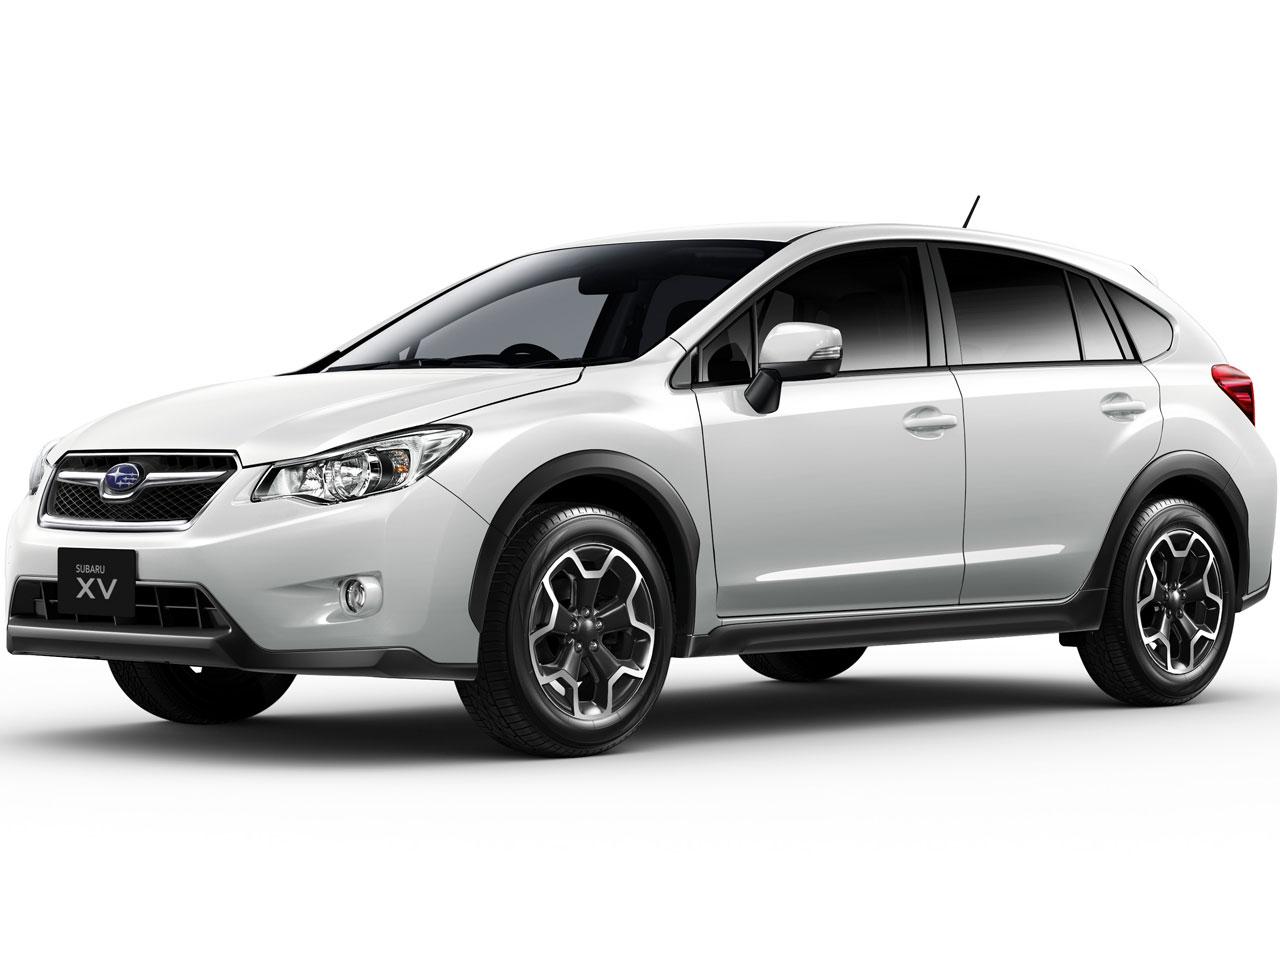 41286 besides Best Gas Mileage furthermore Subaru Xv 2018 Llega A Mexico Desde 368900 Pesos likewise Boot Sizes Of Australias Best Selling Suvs in addition 20. on suburu xv crosstrek